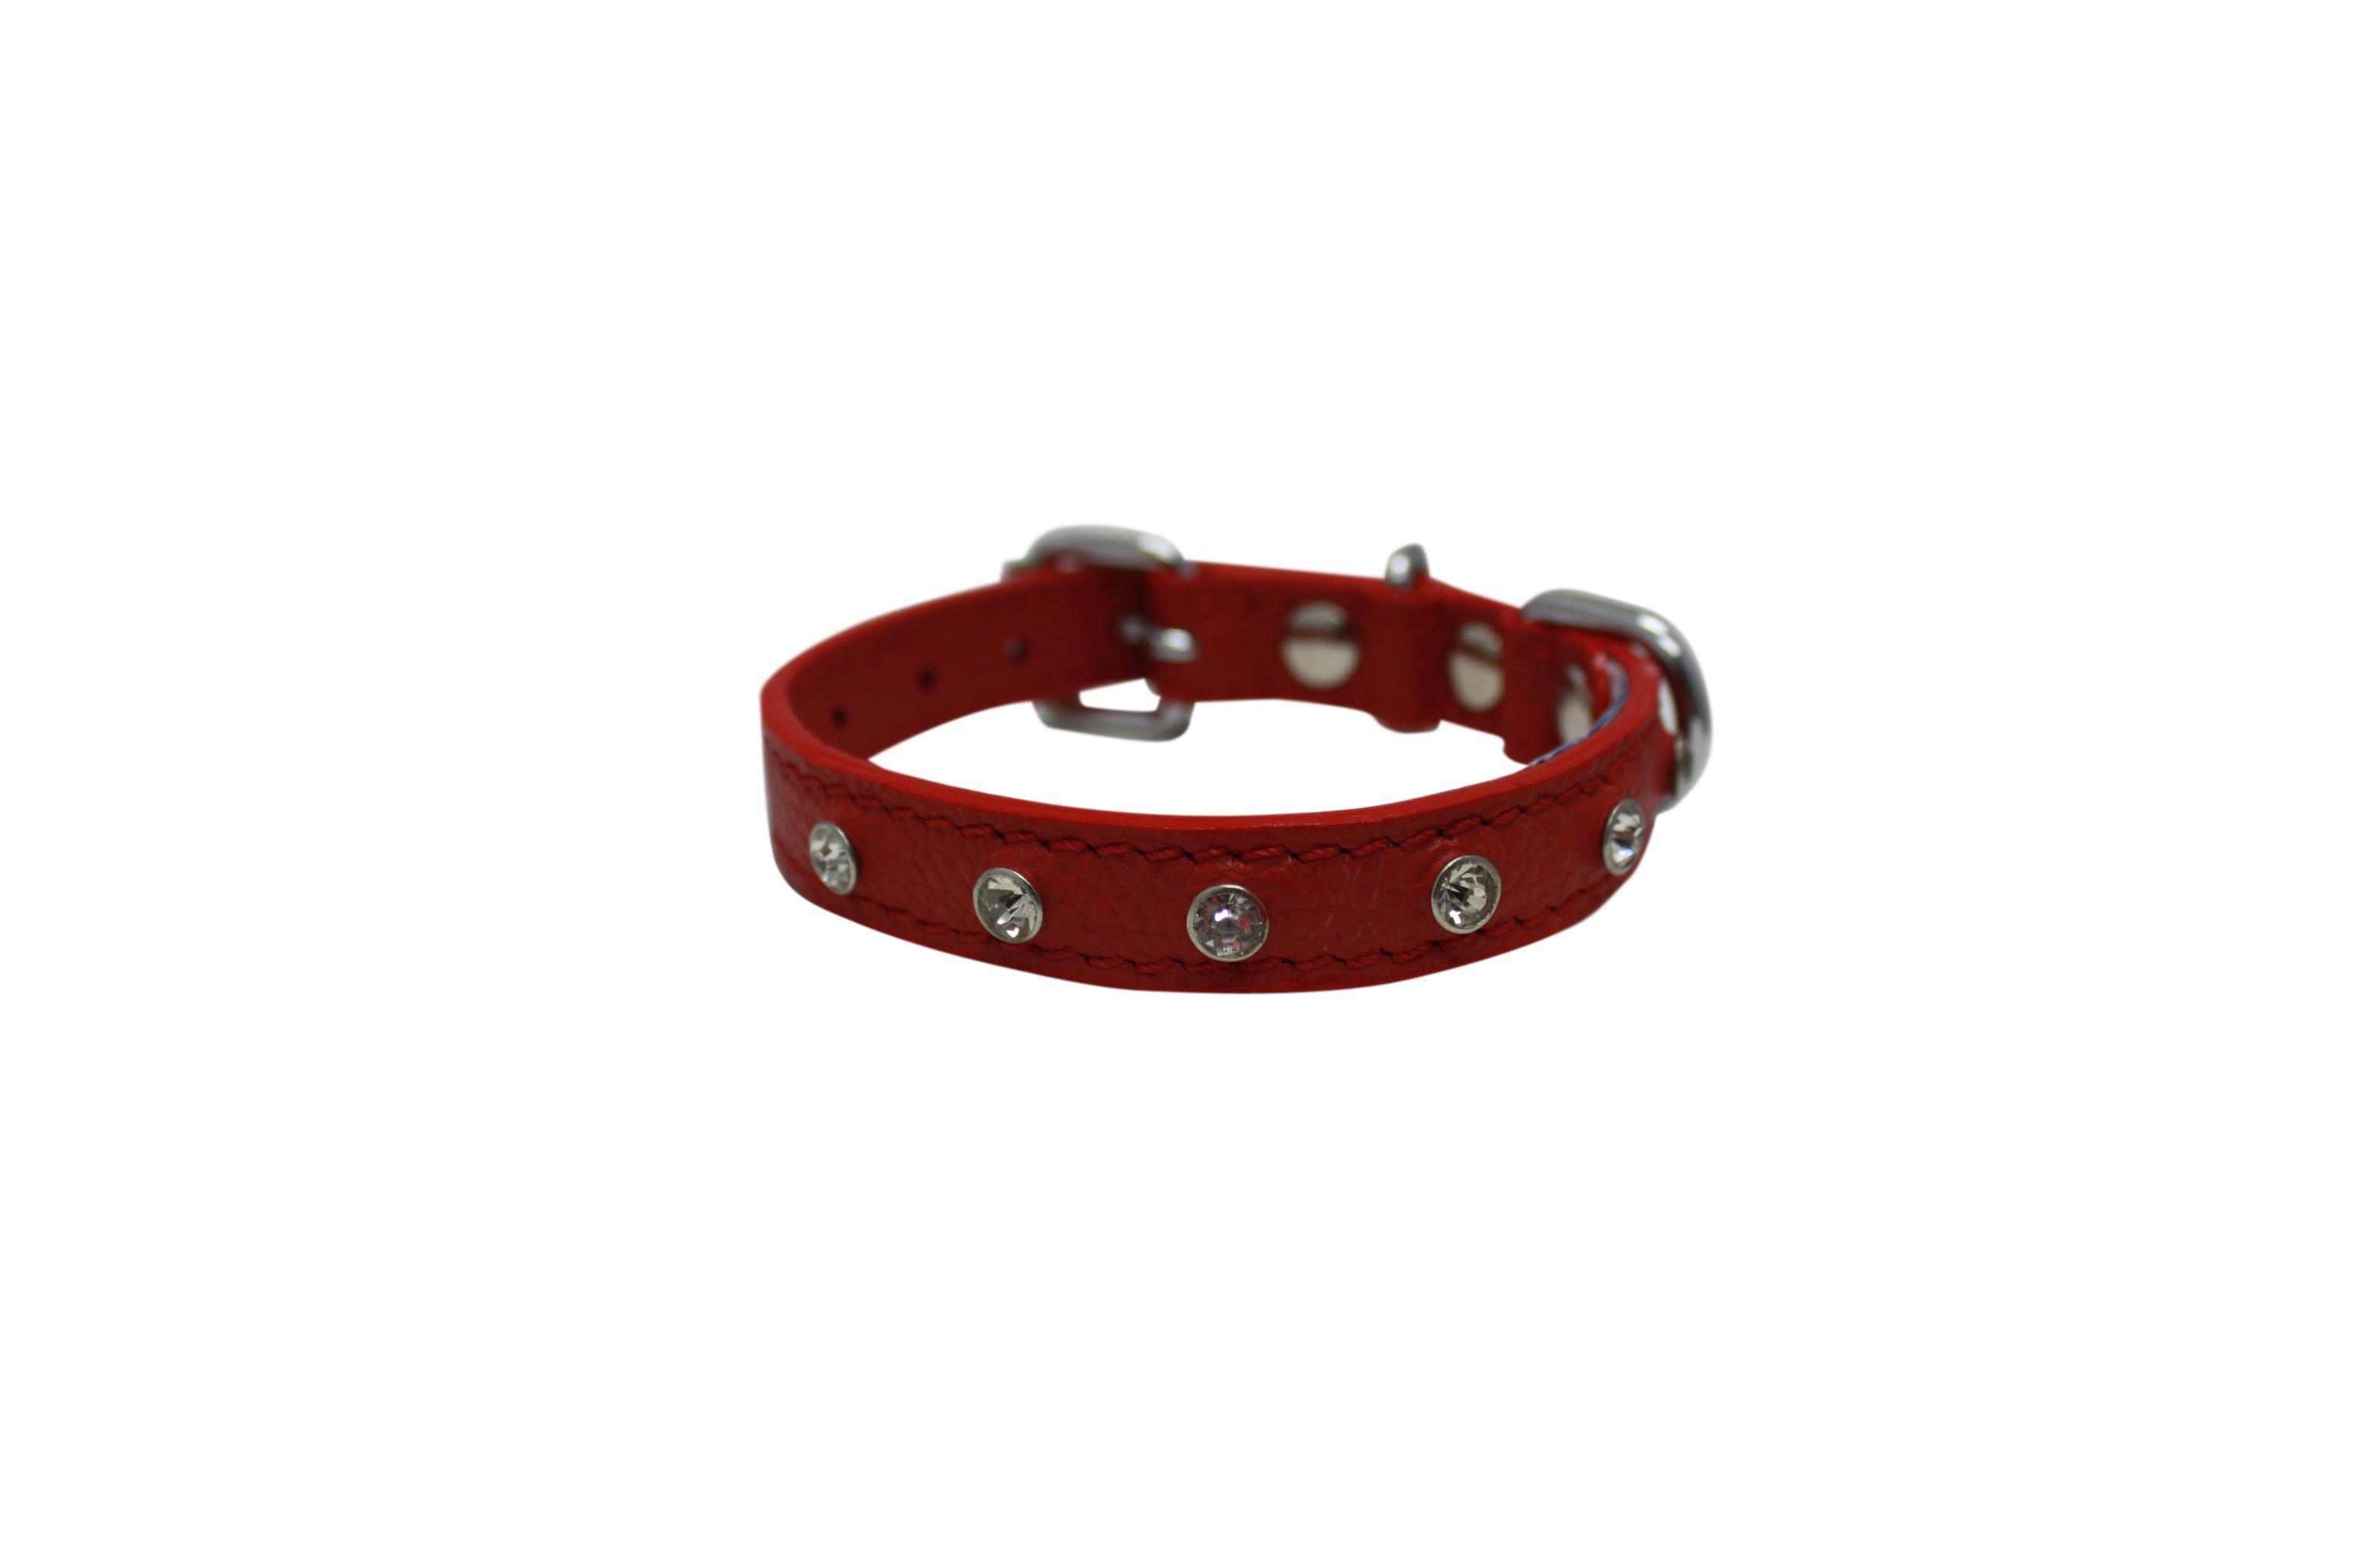 Angel Athens Rhinestone Dog Collar, Valentine Red, 12-in x 0.625-in